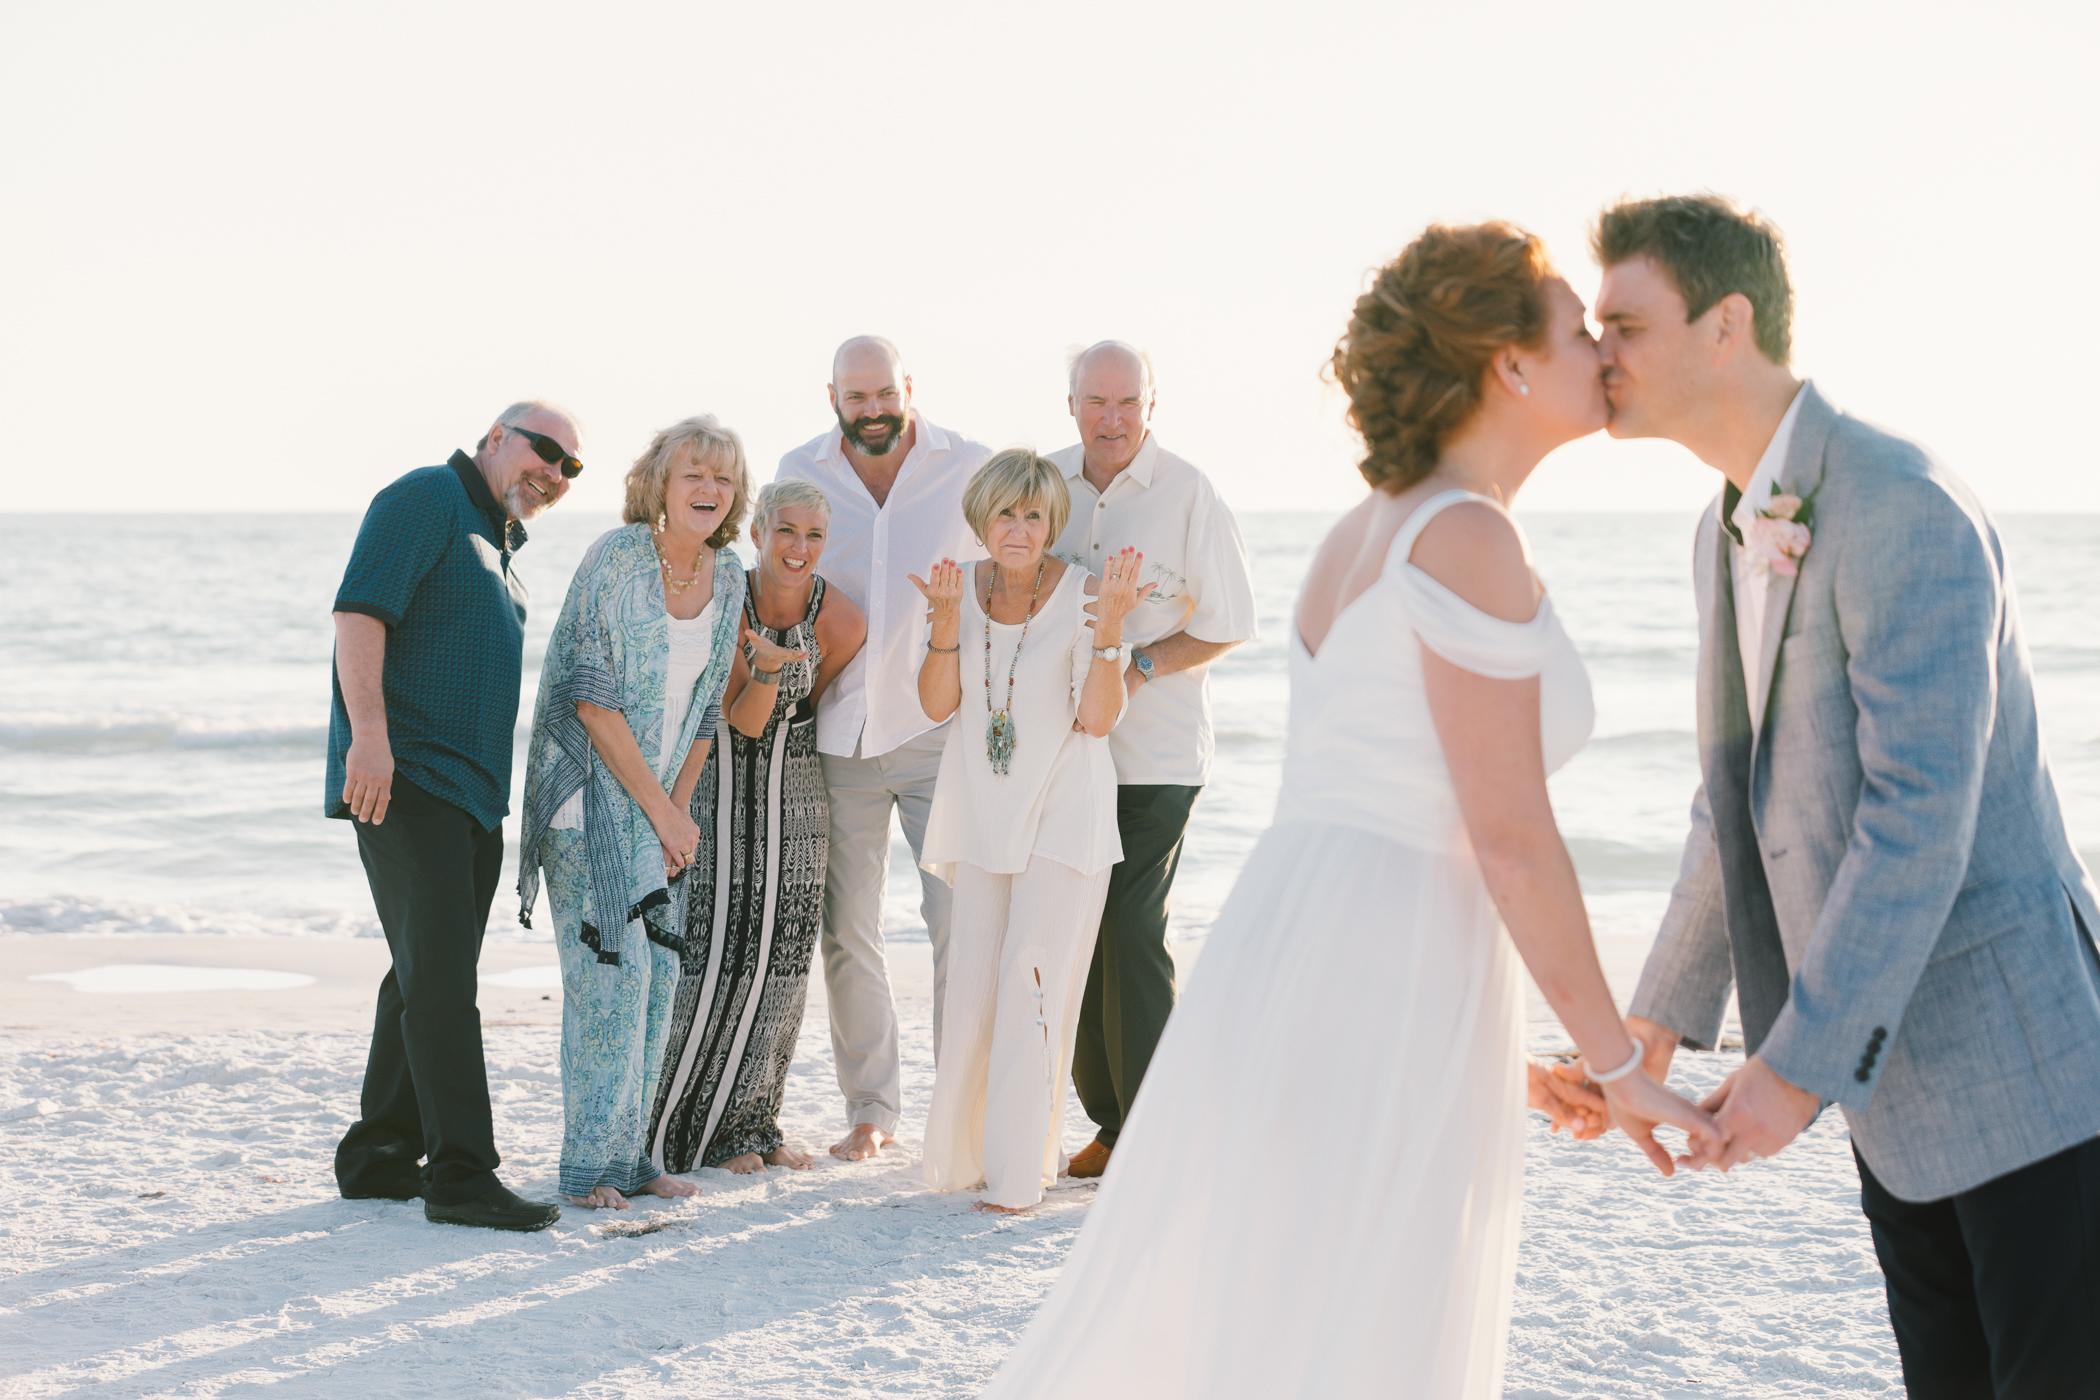 Lido-key-beach-wedding-photography, Sarasota-wedding-photography